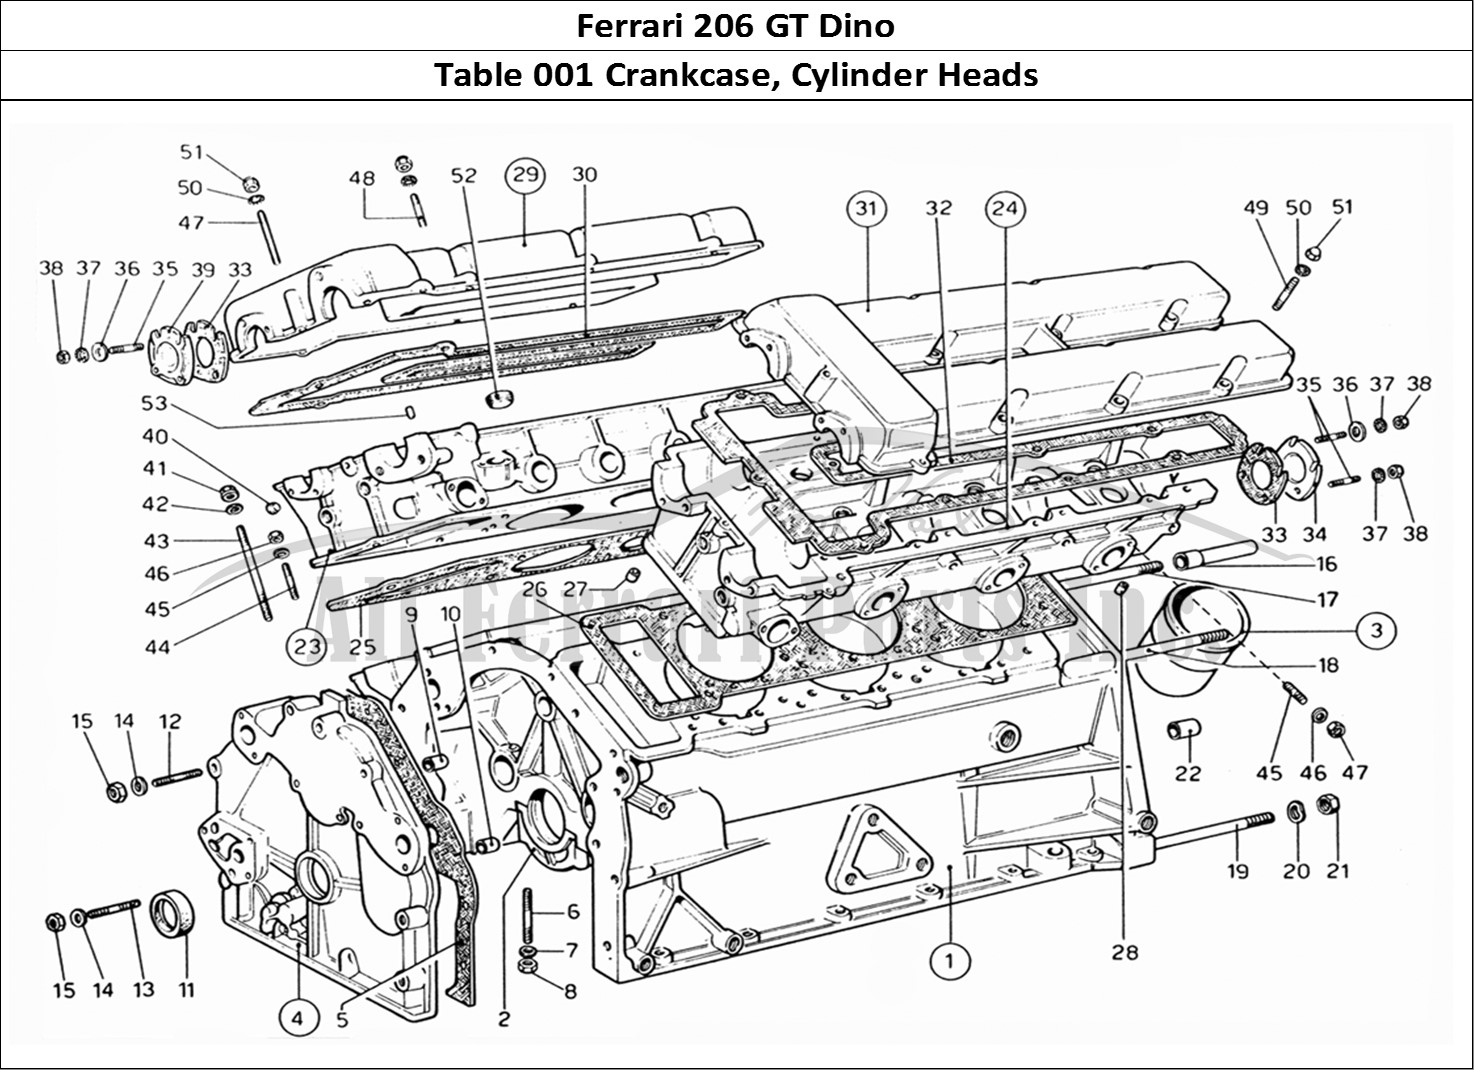 Buy Original Ferrari 206 Gt Dino 001 Crankcase Cylinder Heads Ferrari Parts Spares